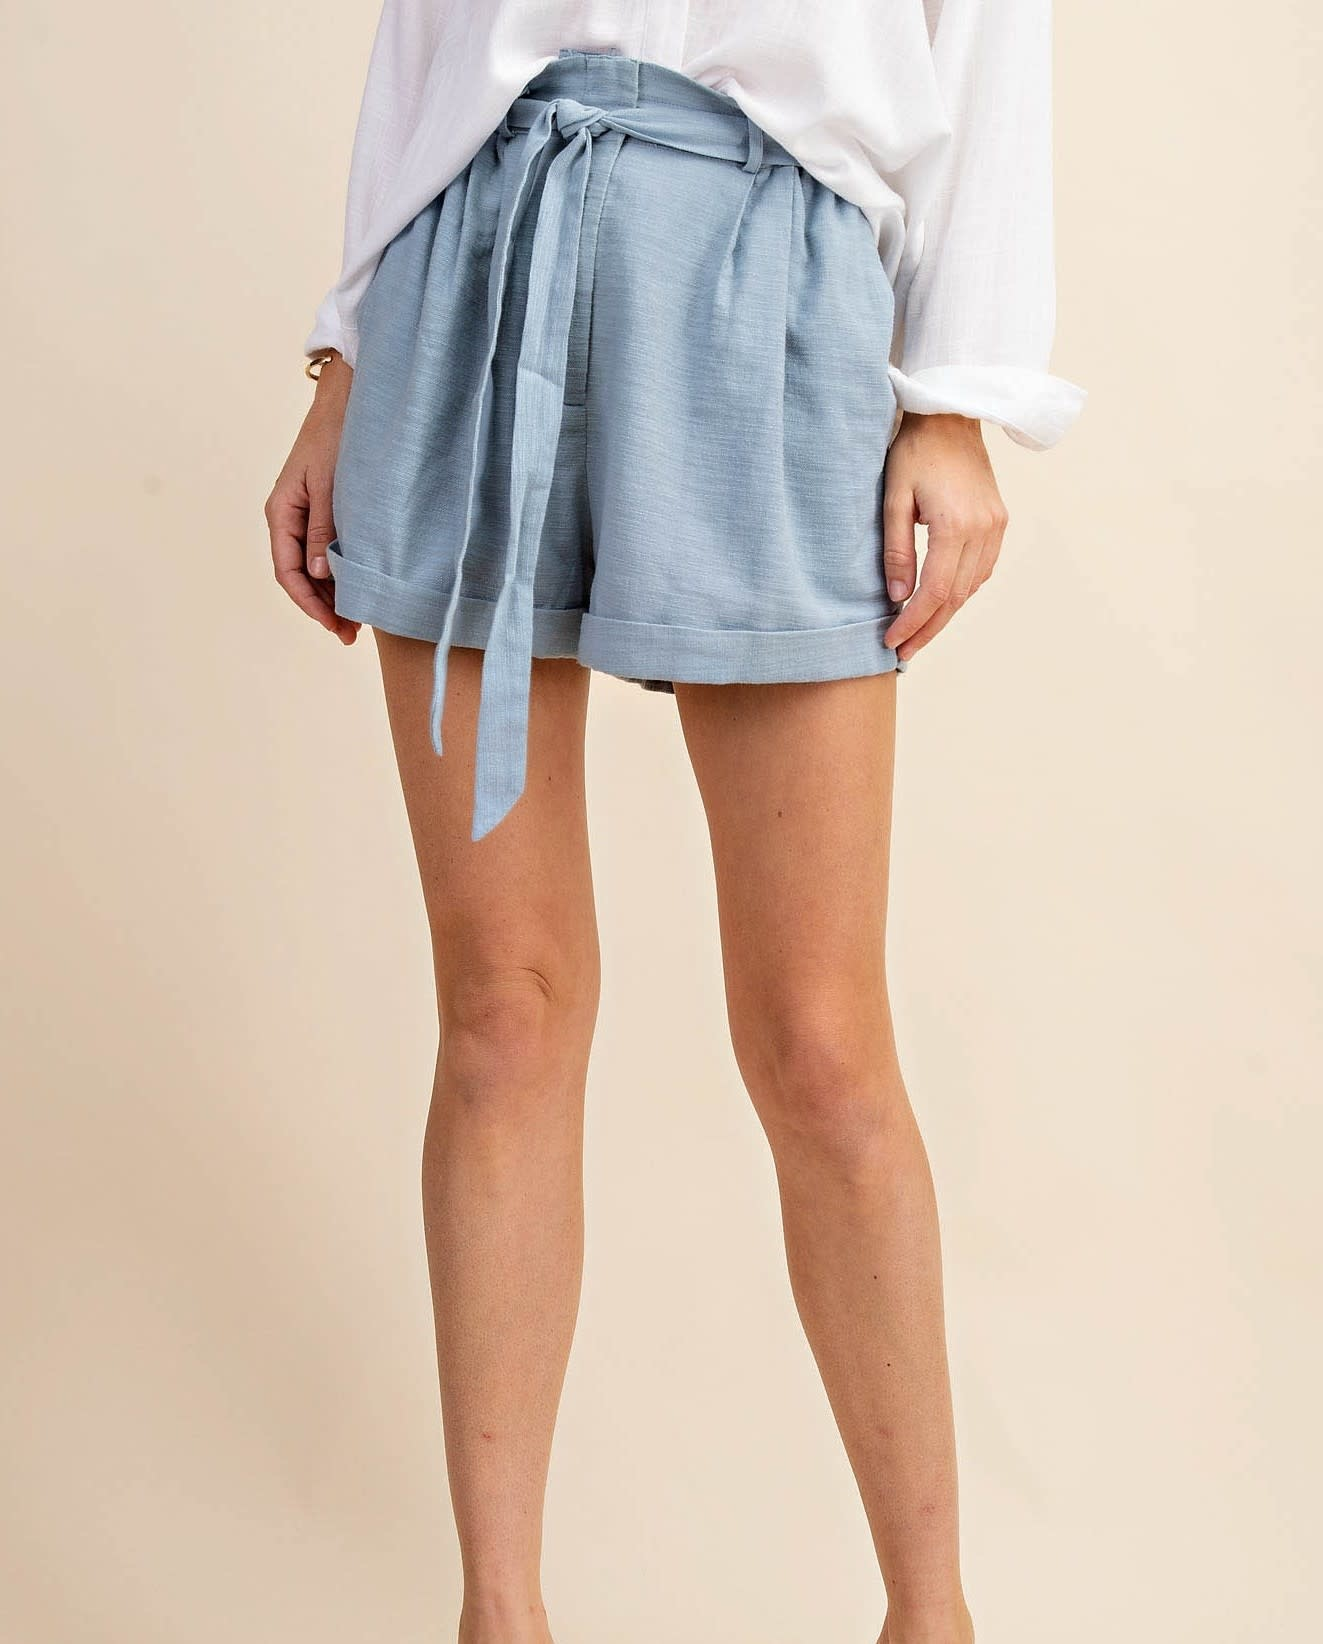 Textured Sugarbag Bottom Turn Up Shorts